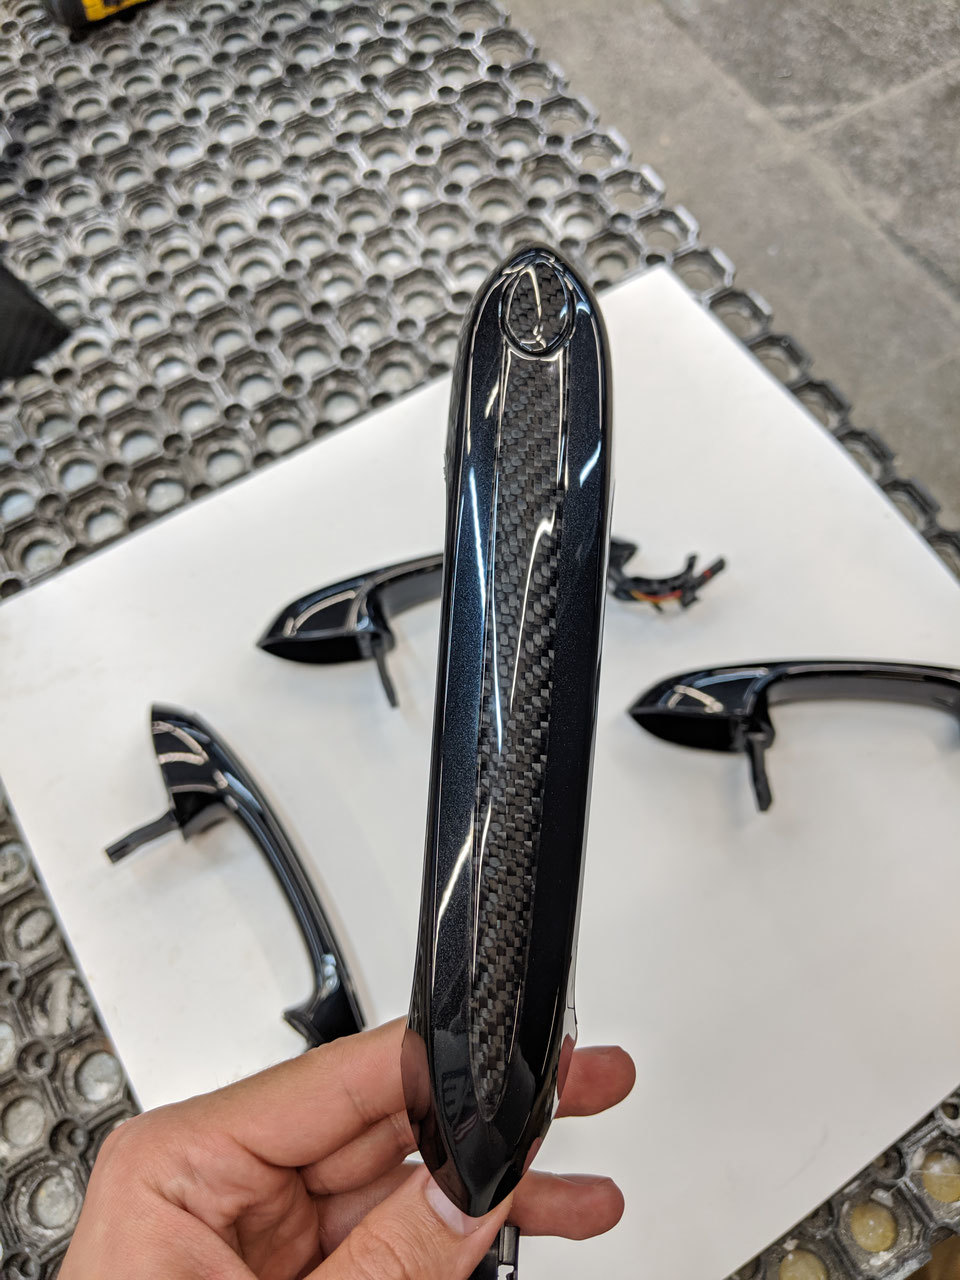 Hodoor Performance Carbon Fiber Set for BMW X5 G05